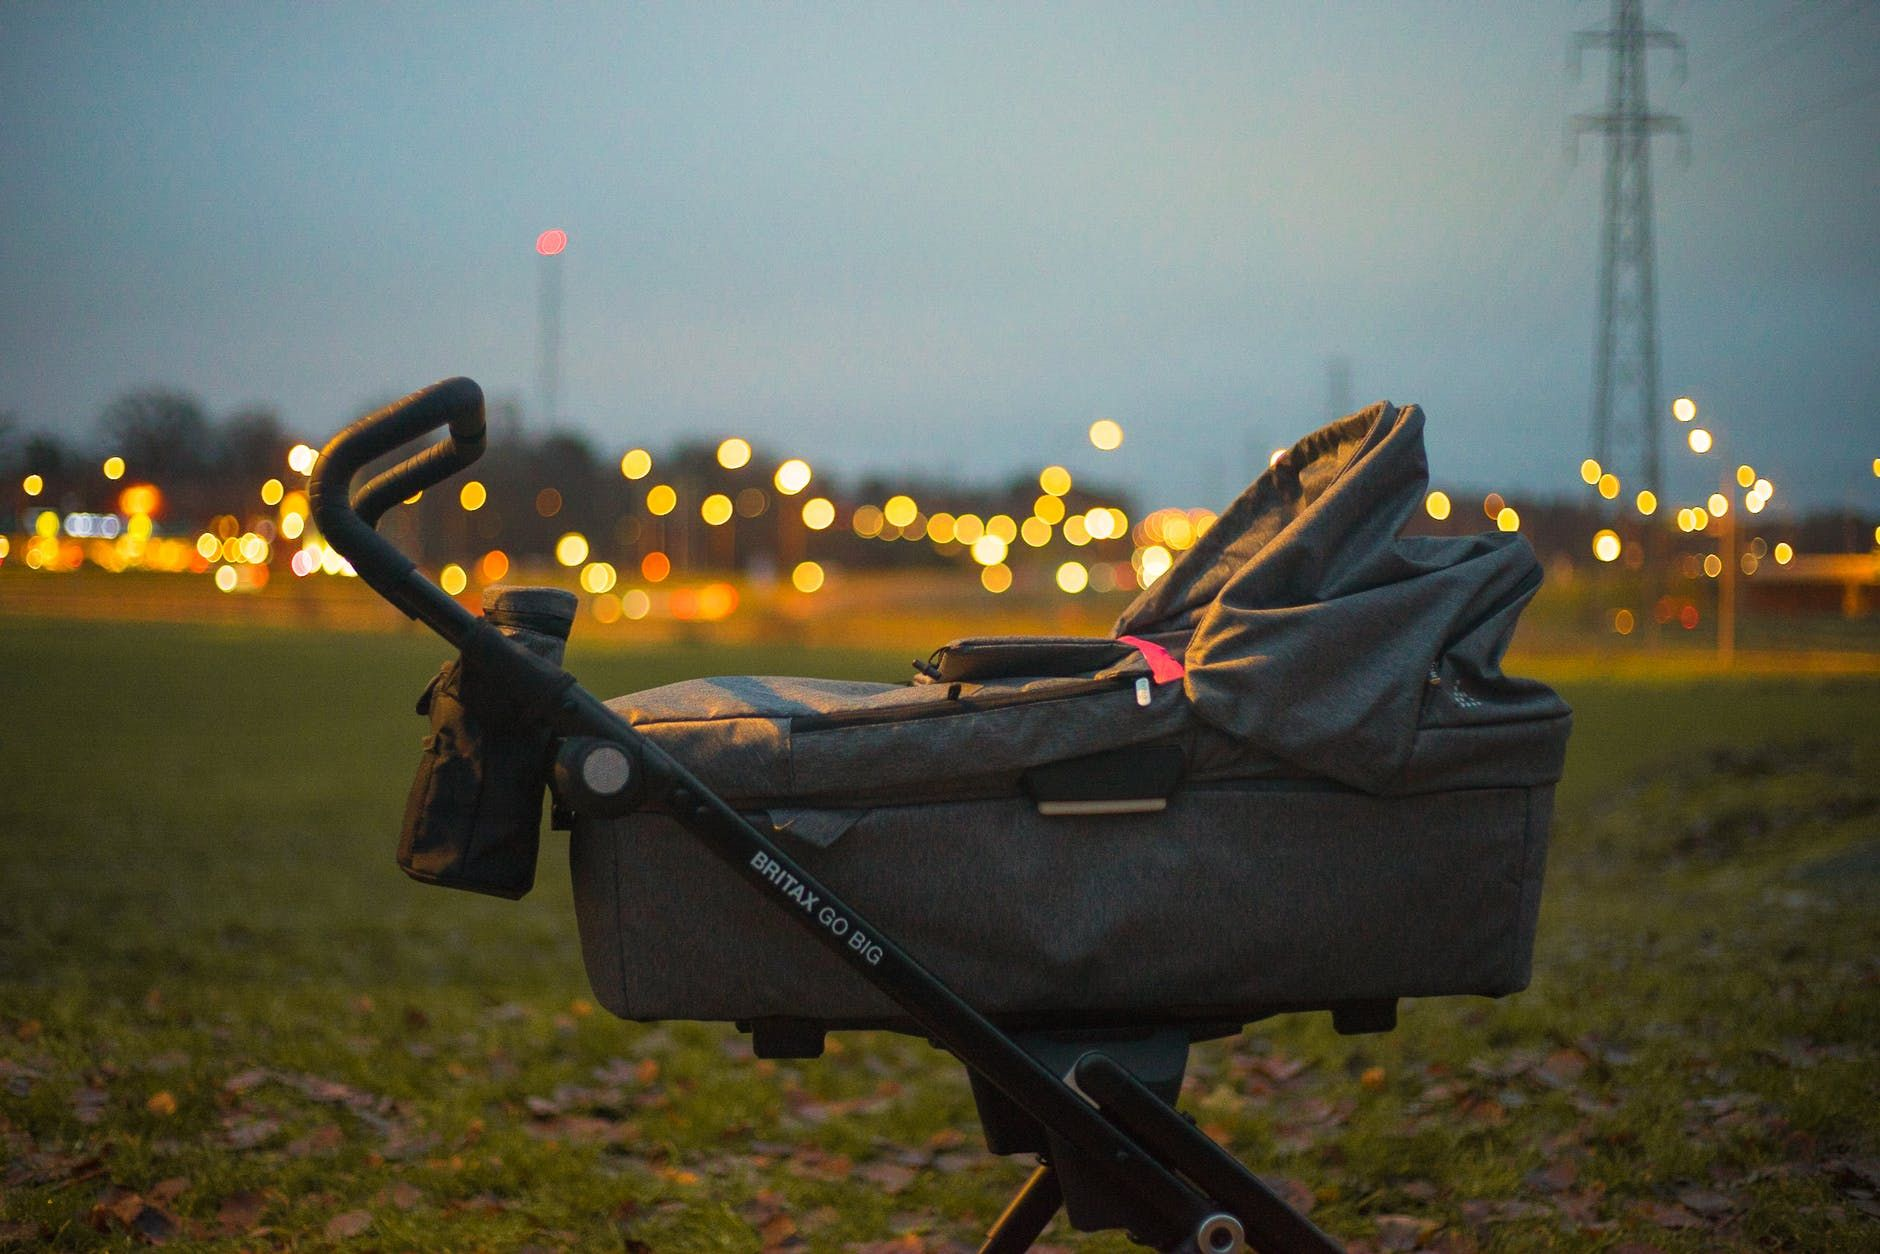 Strollers Stroller, Bob stroller, Baby strollers jogging